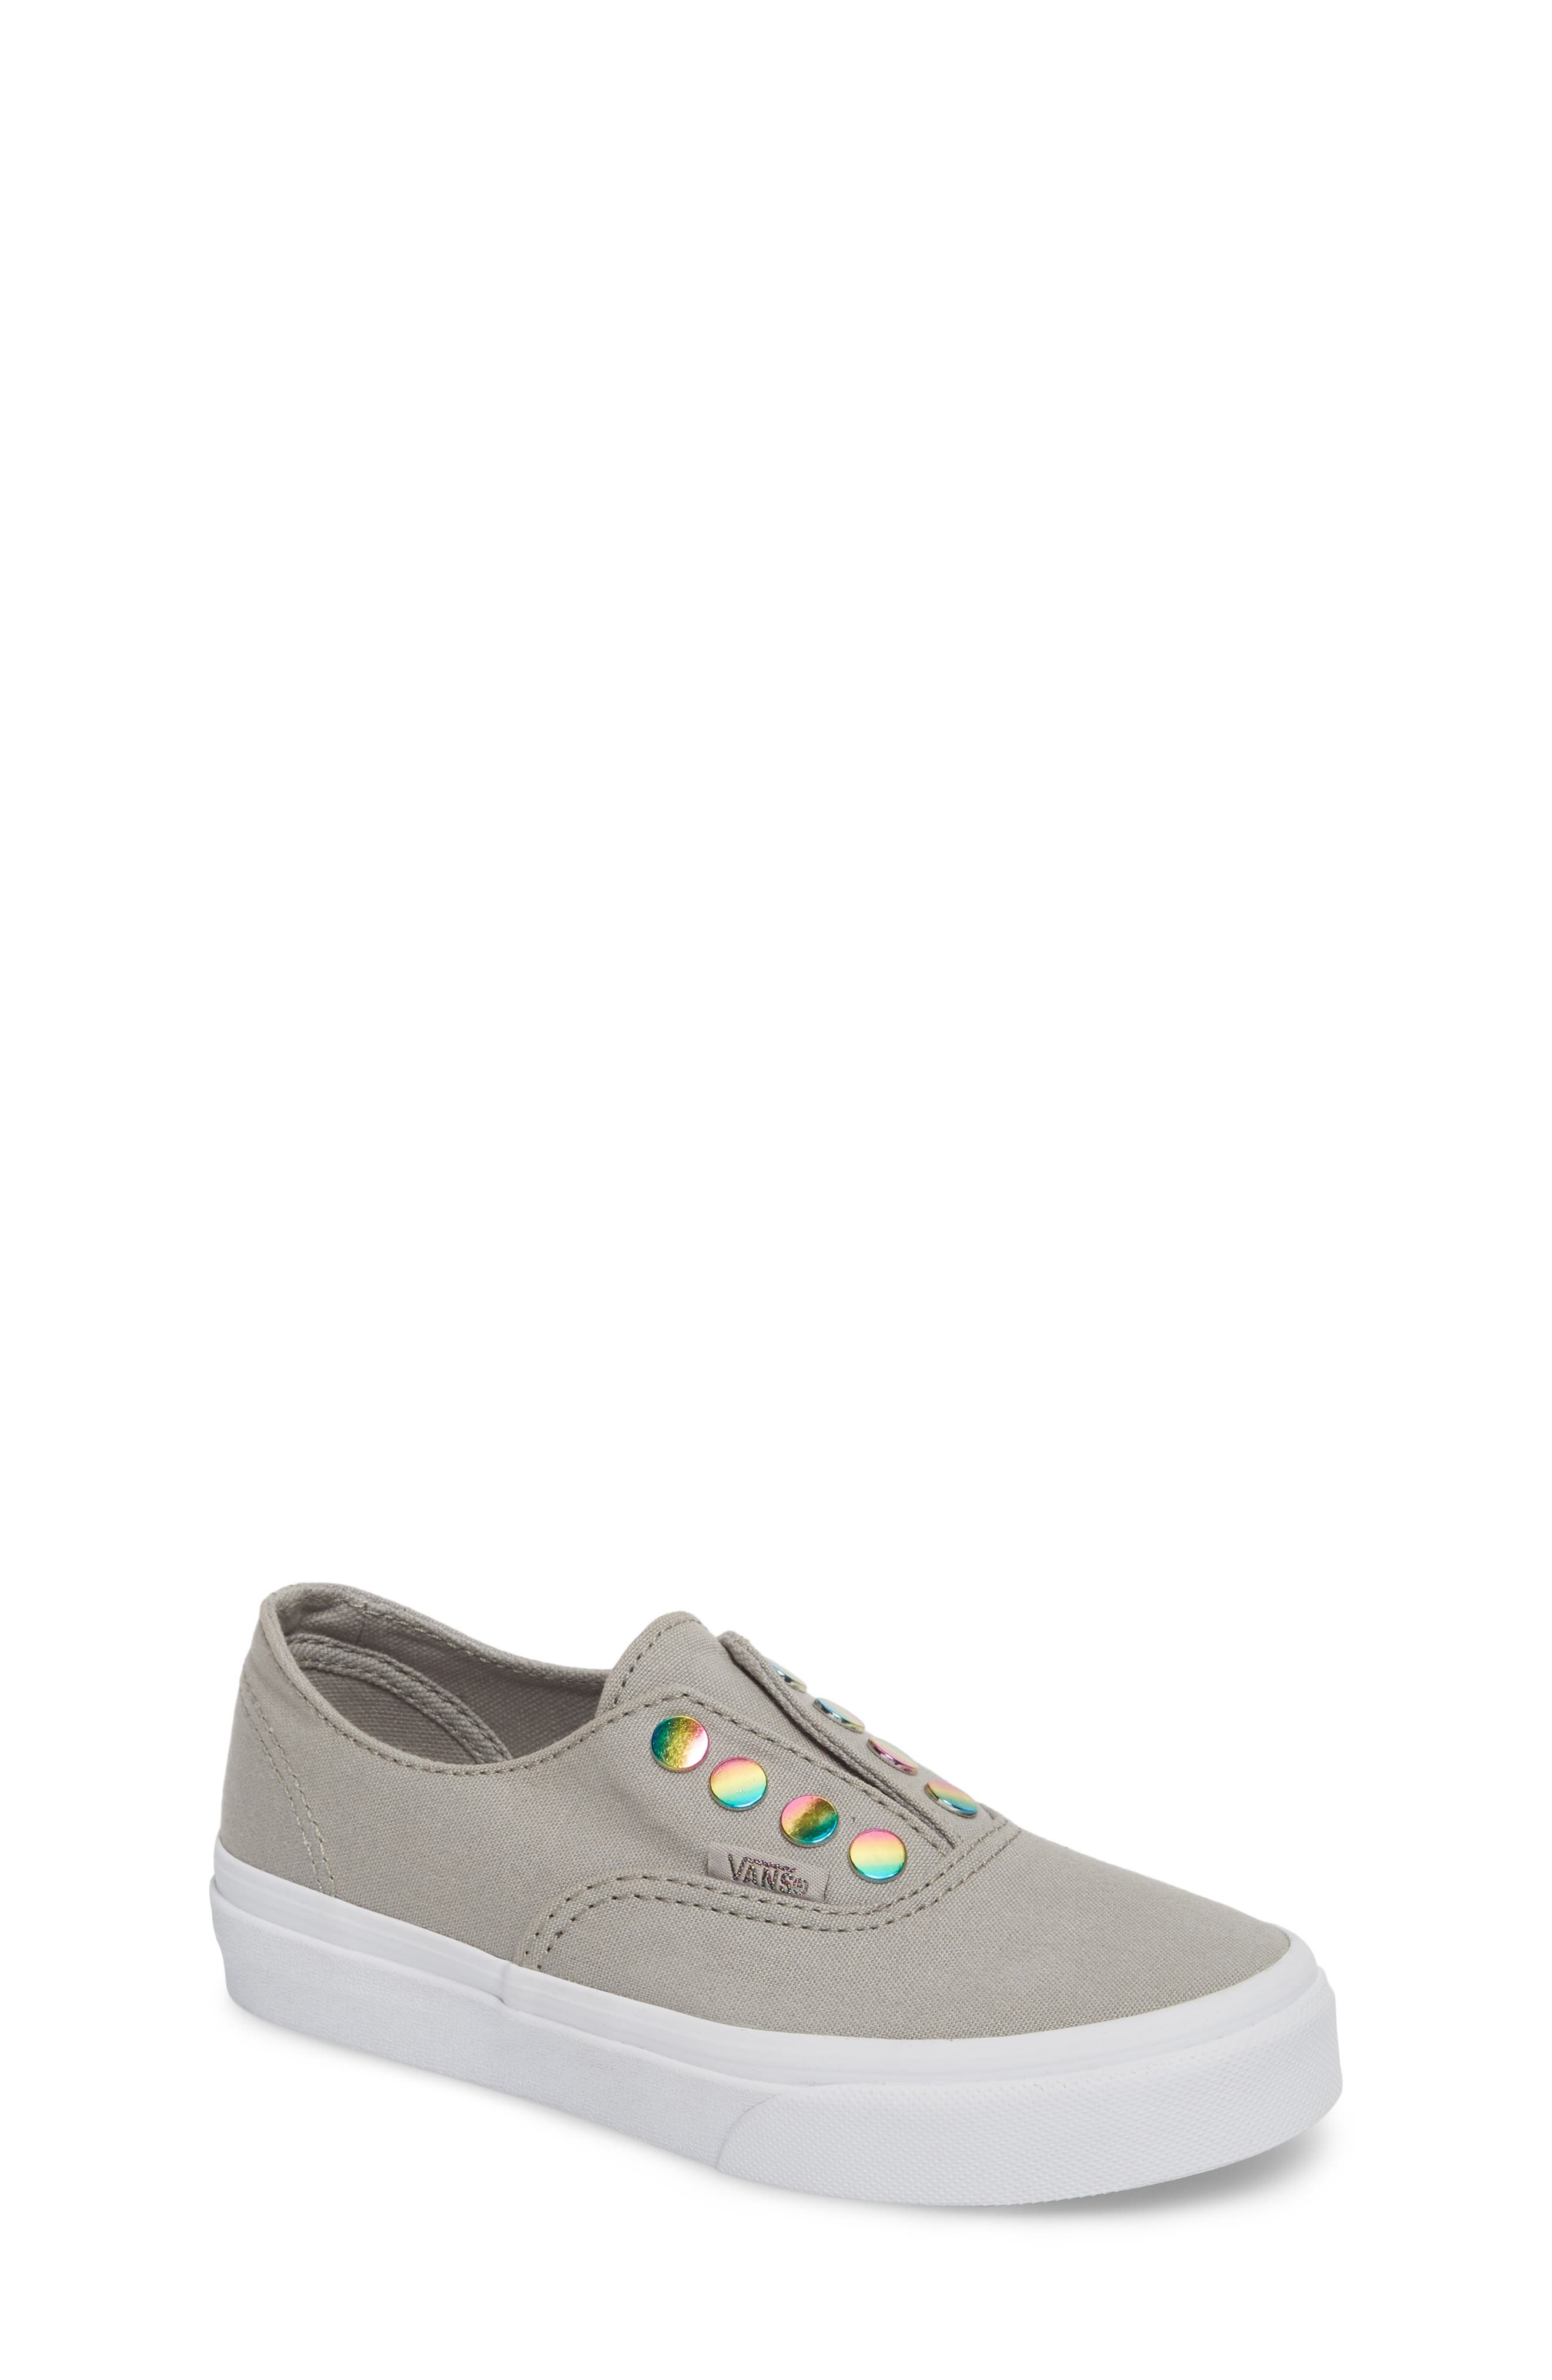 Vans Authentic Gore Slip-On Sneaker (Toddler, Little Kid & Big Kid)